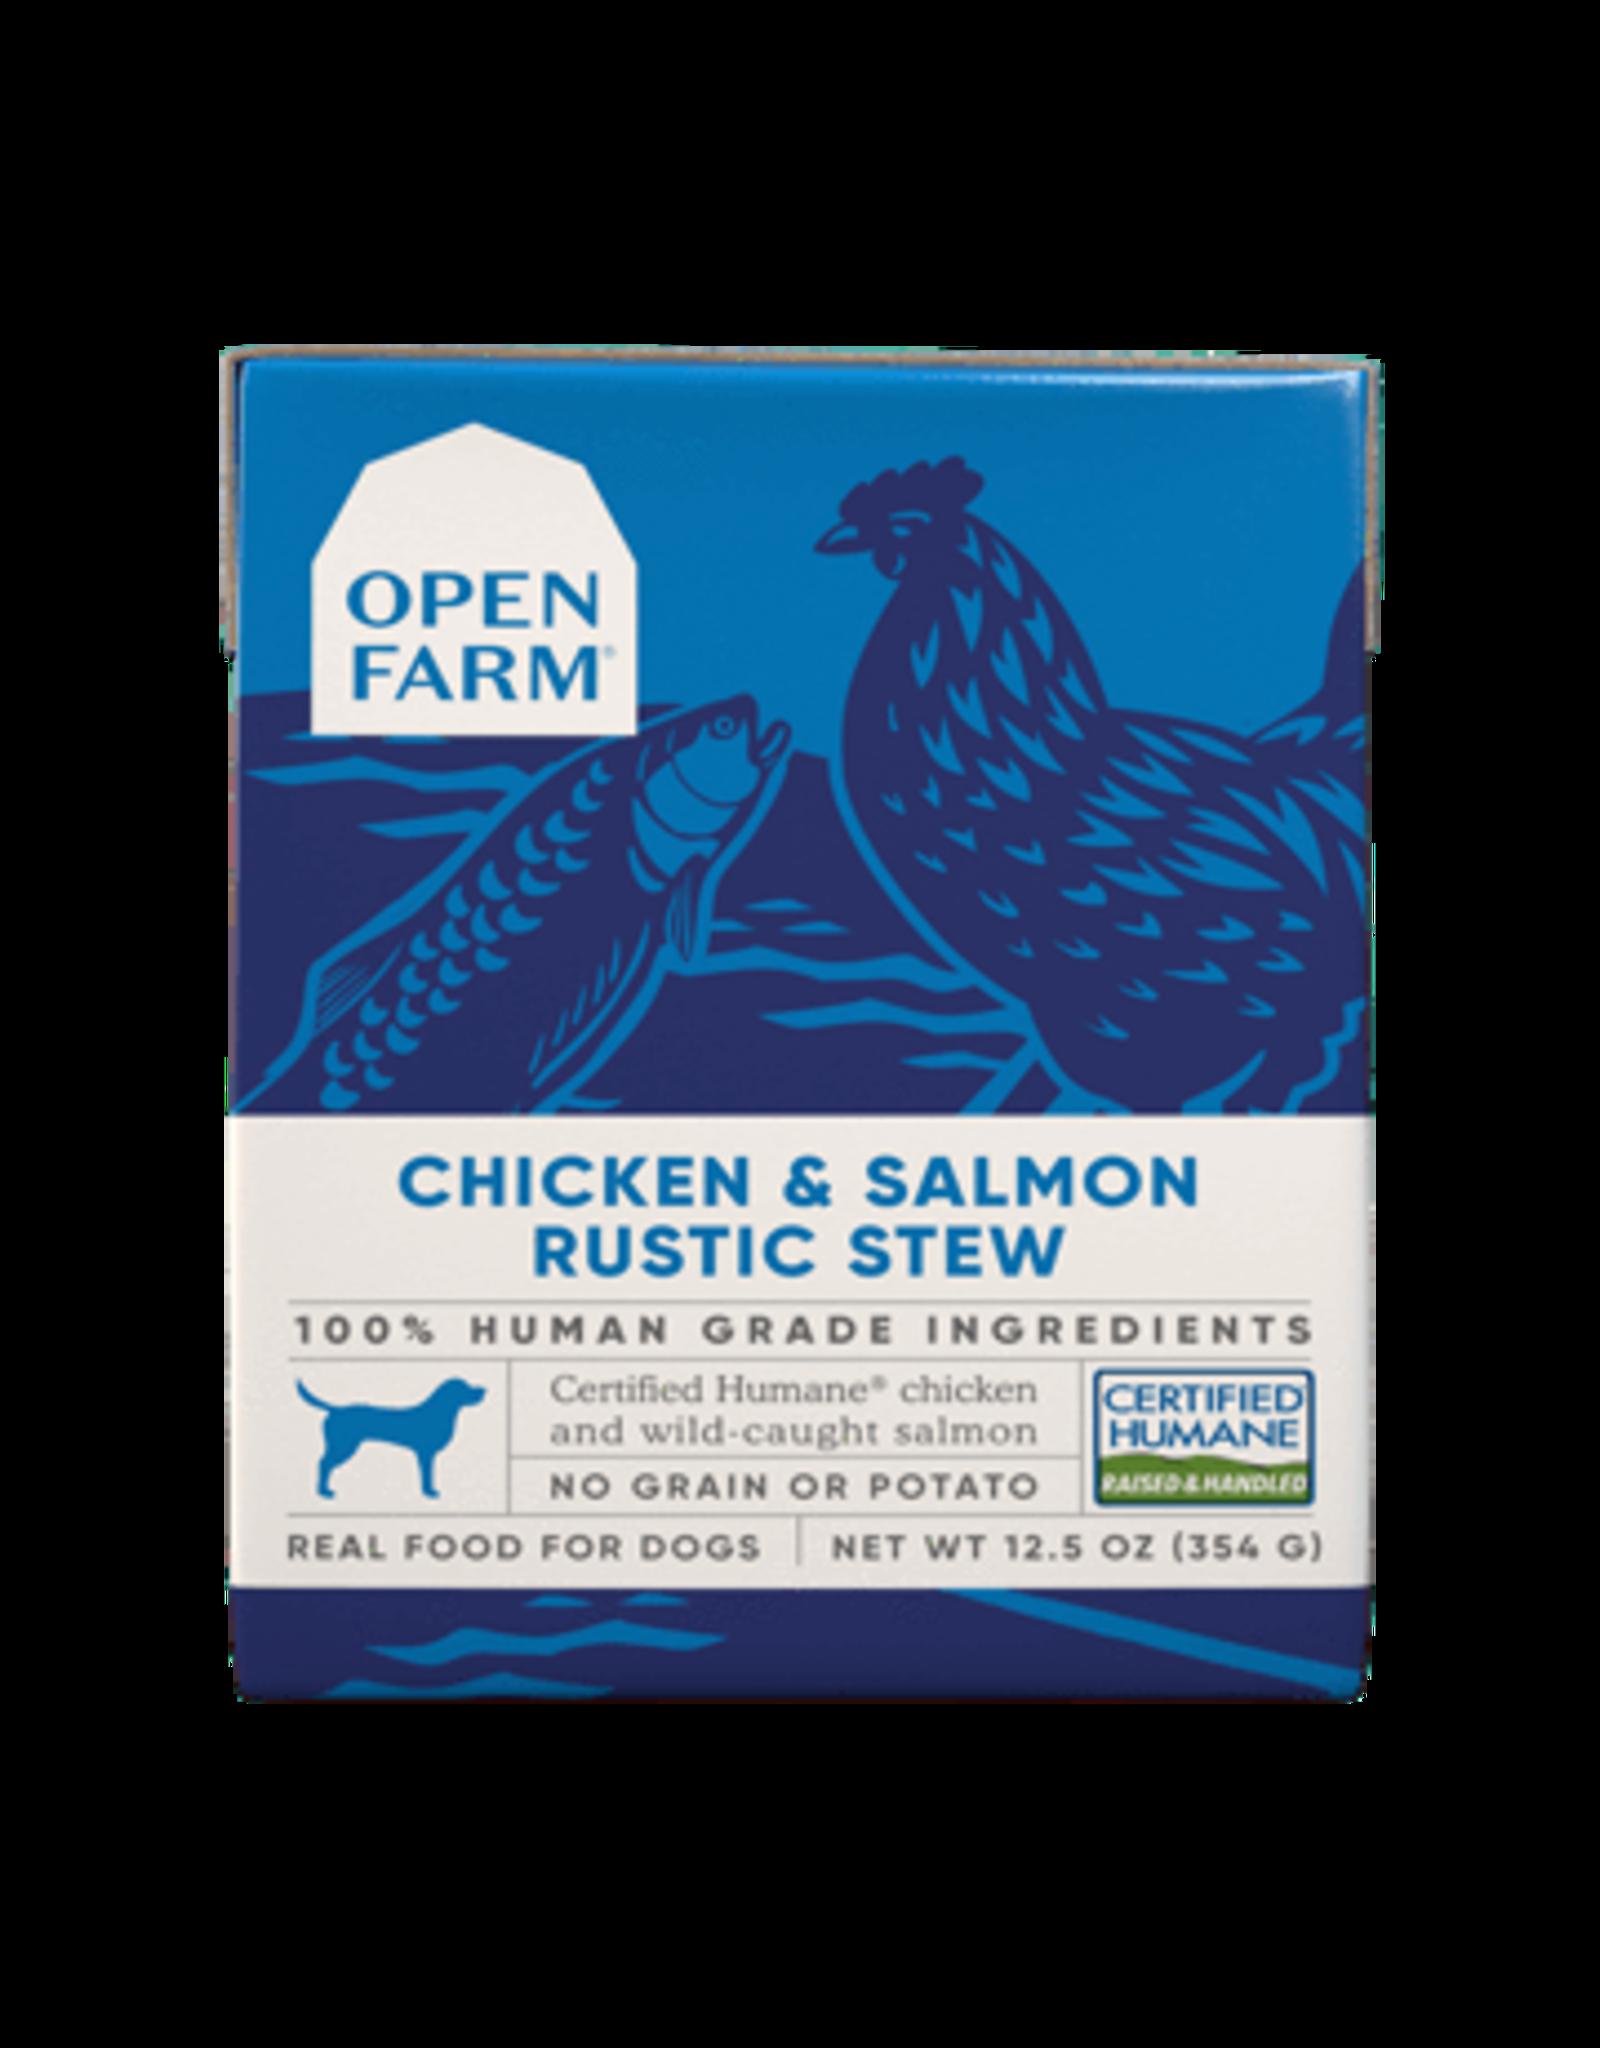 Open Farm Open Farm Dog Rustic Blend Stews 12.5oz Chicken & Salmon